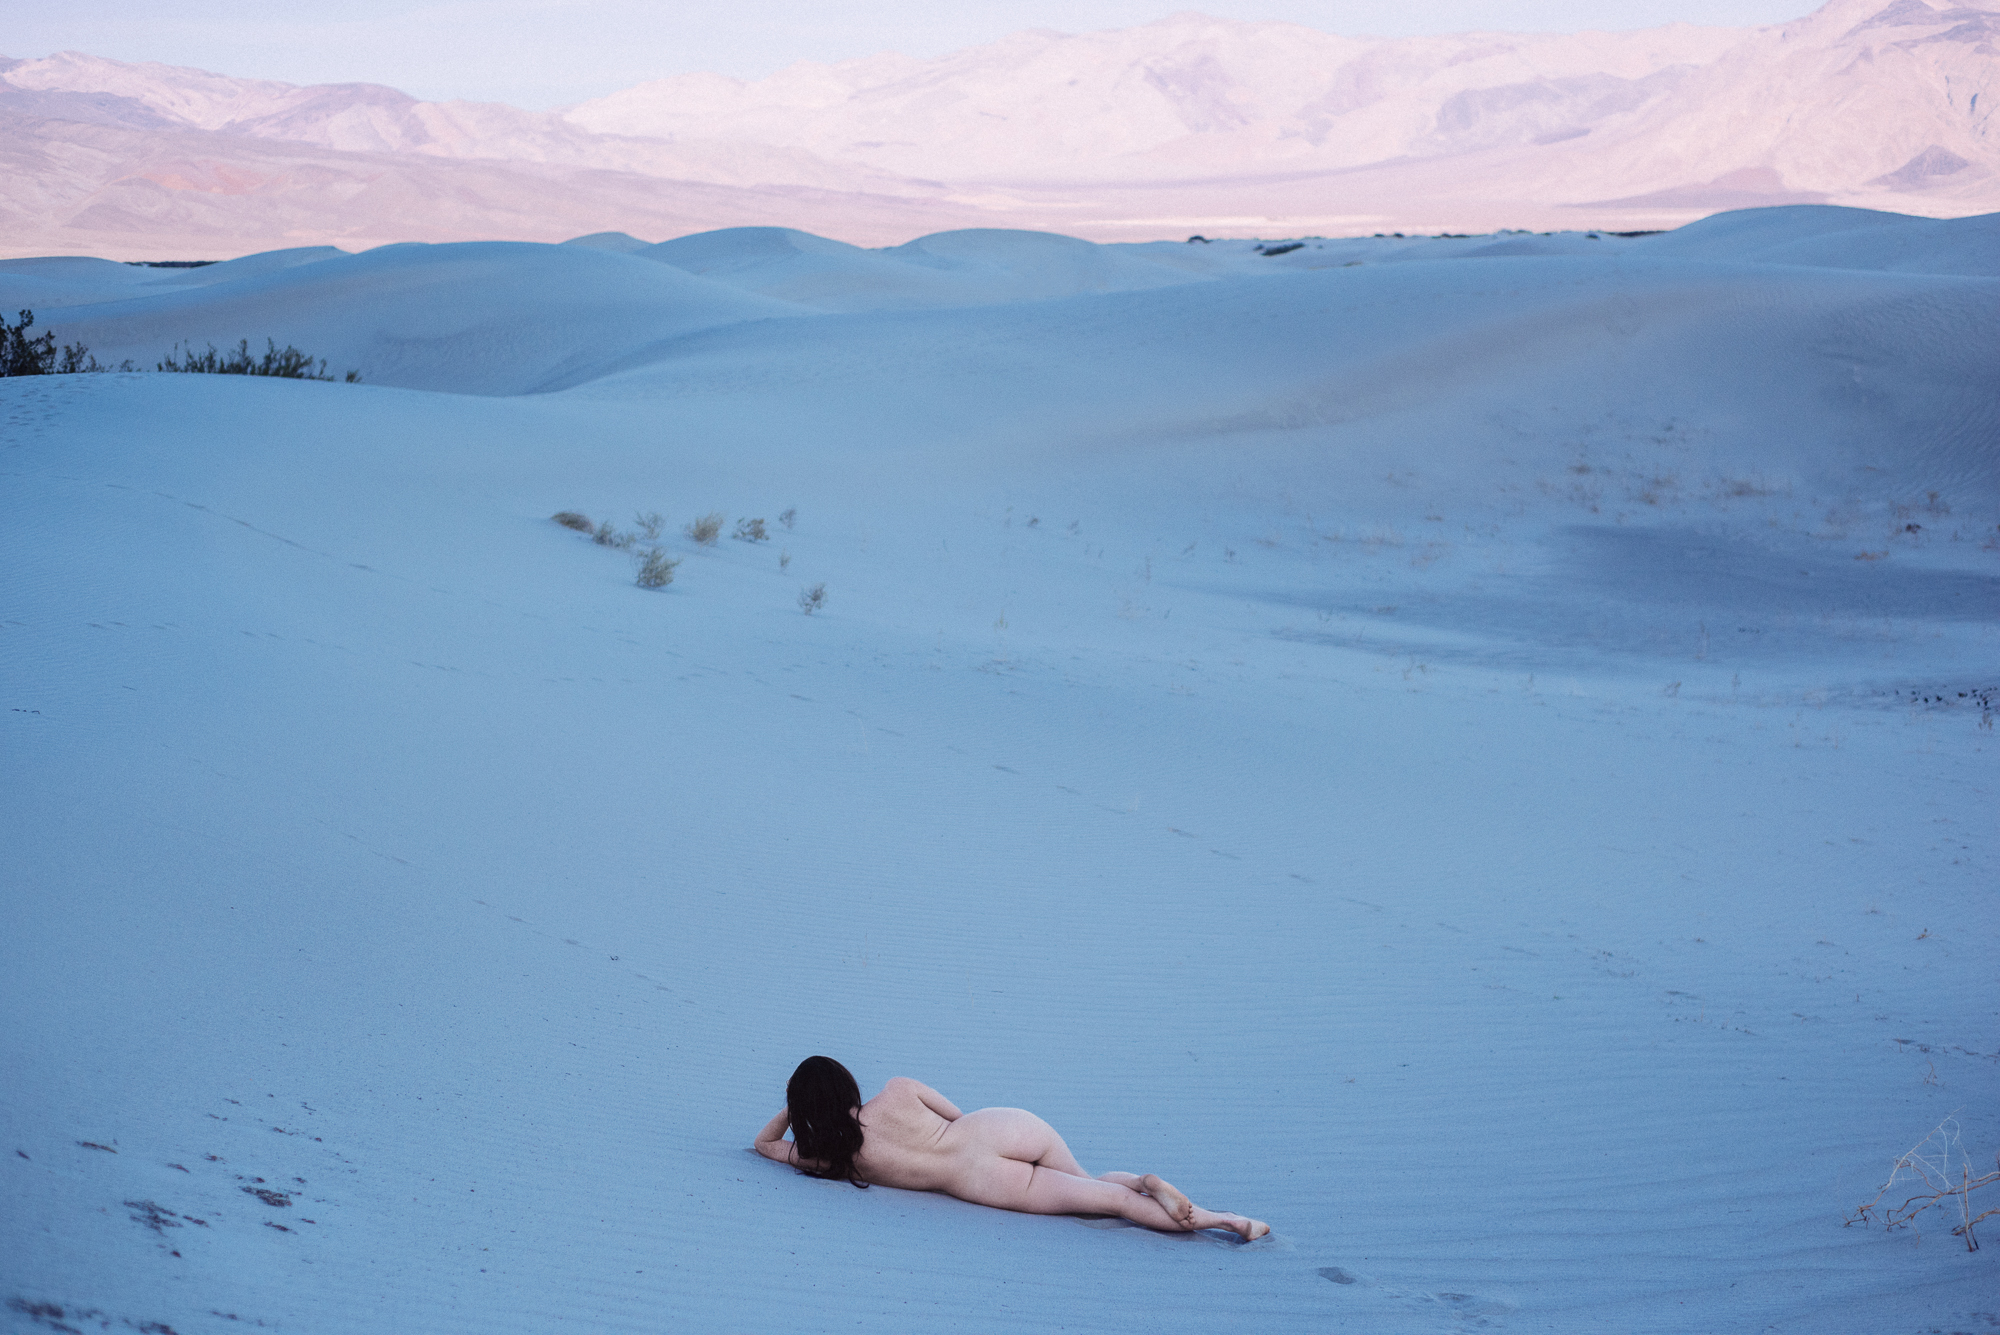 Sasha, Death Valley